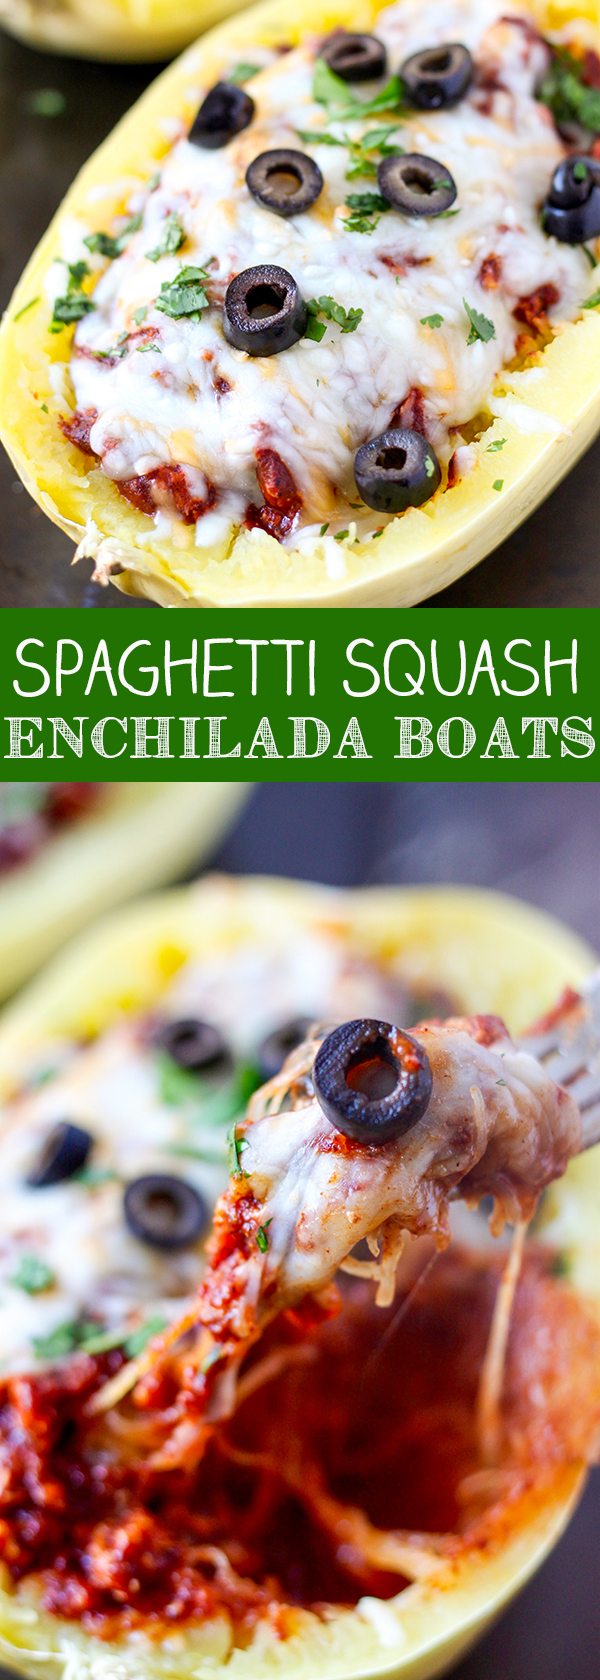 Spaghetti Squash Turkey Enchilada Boats